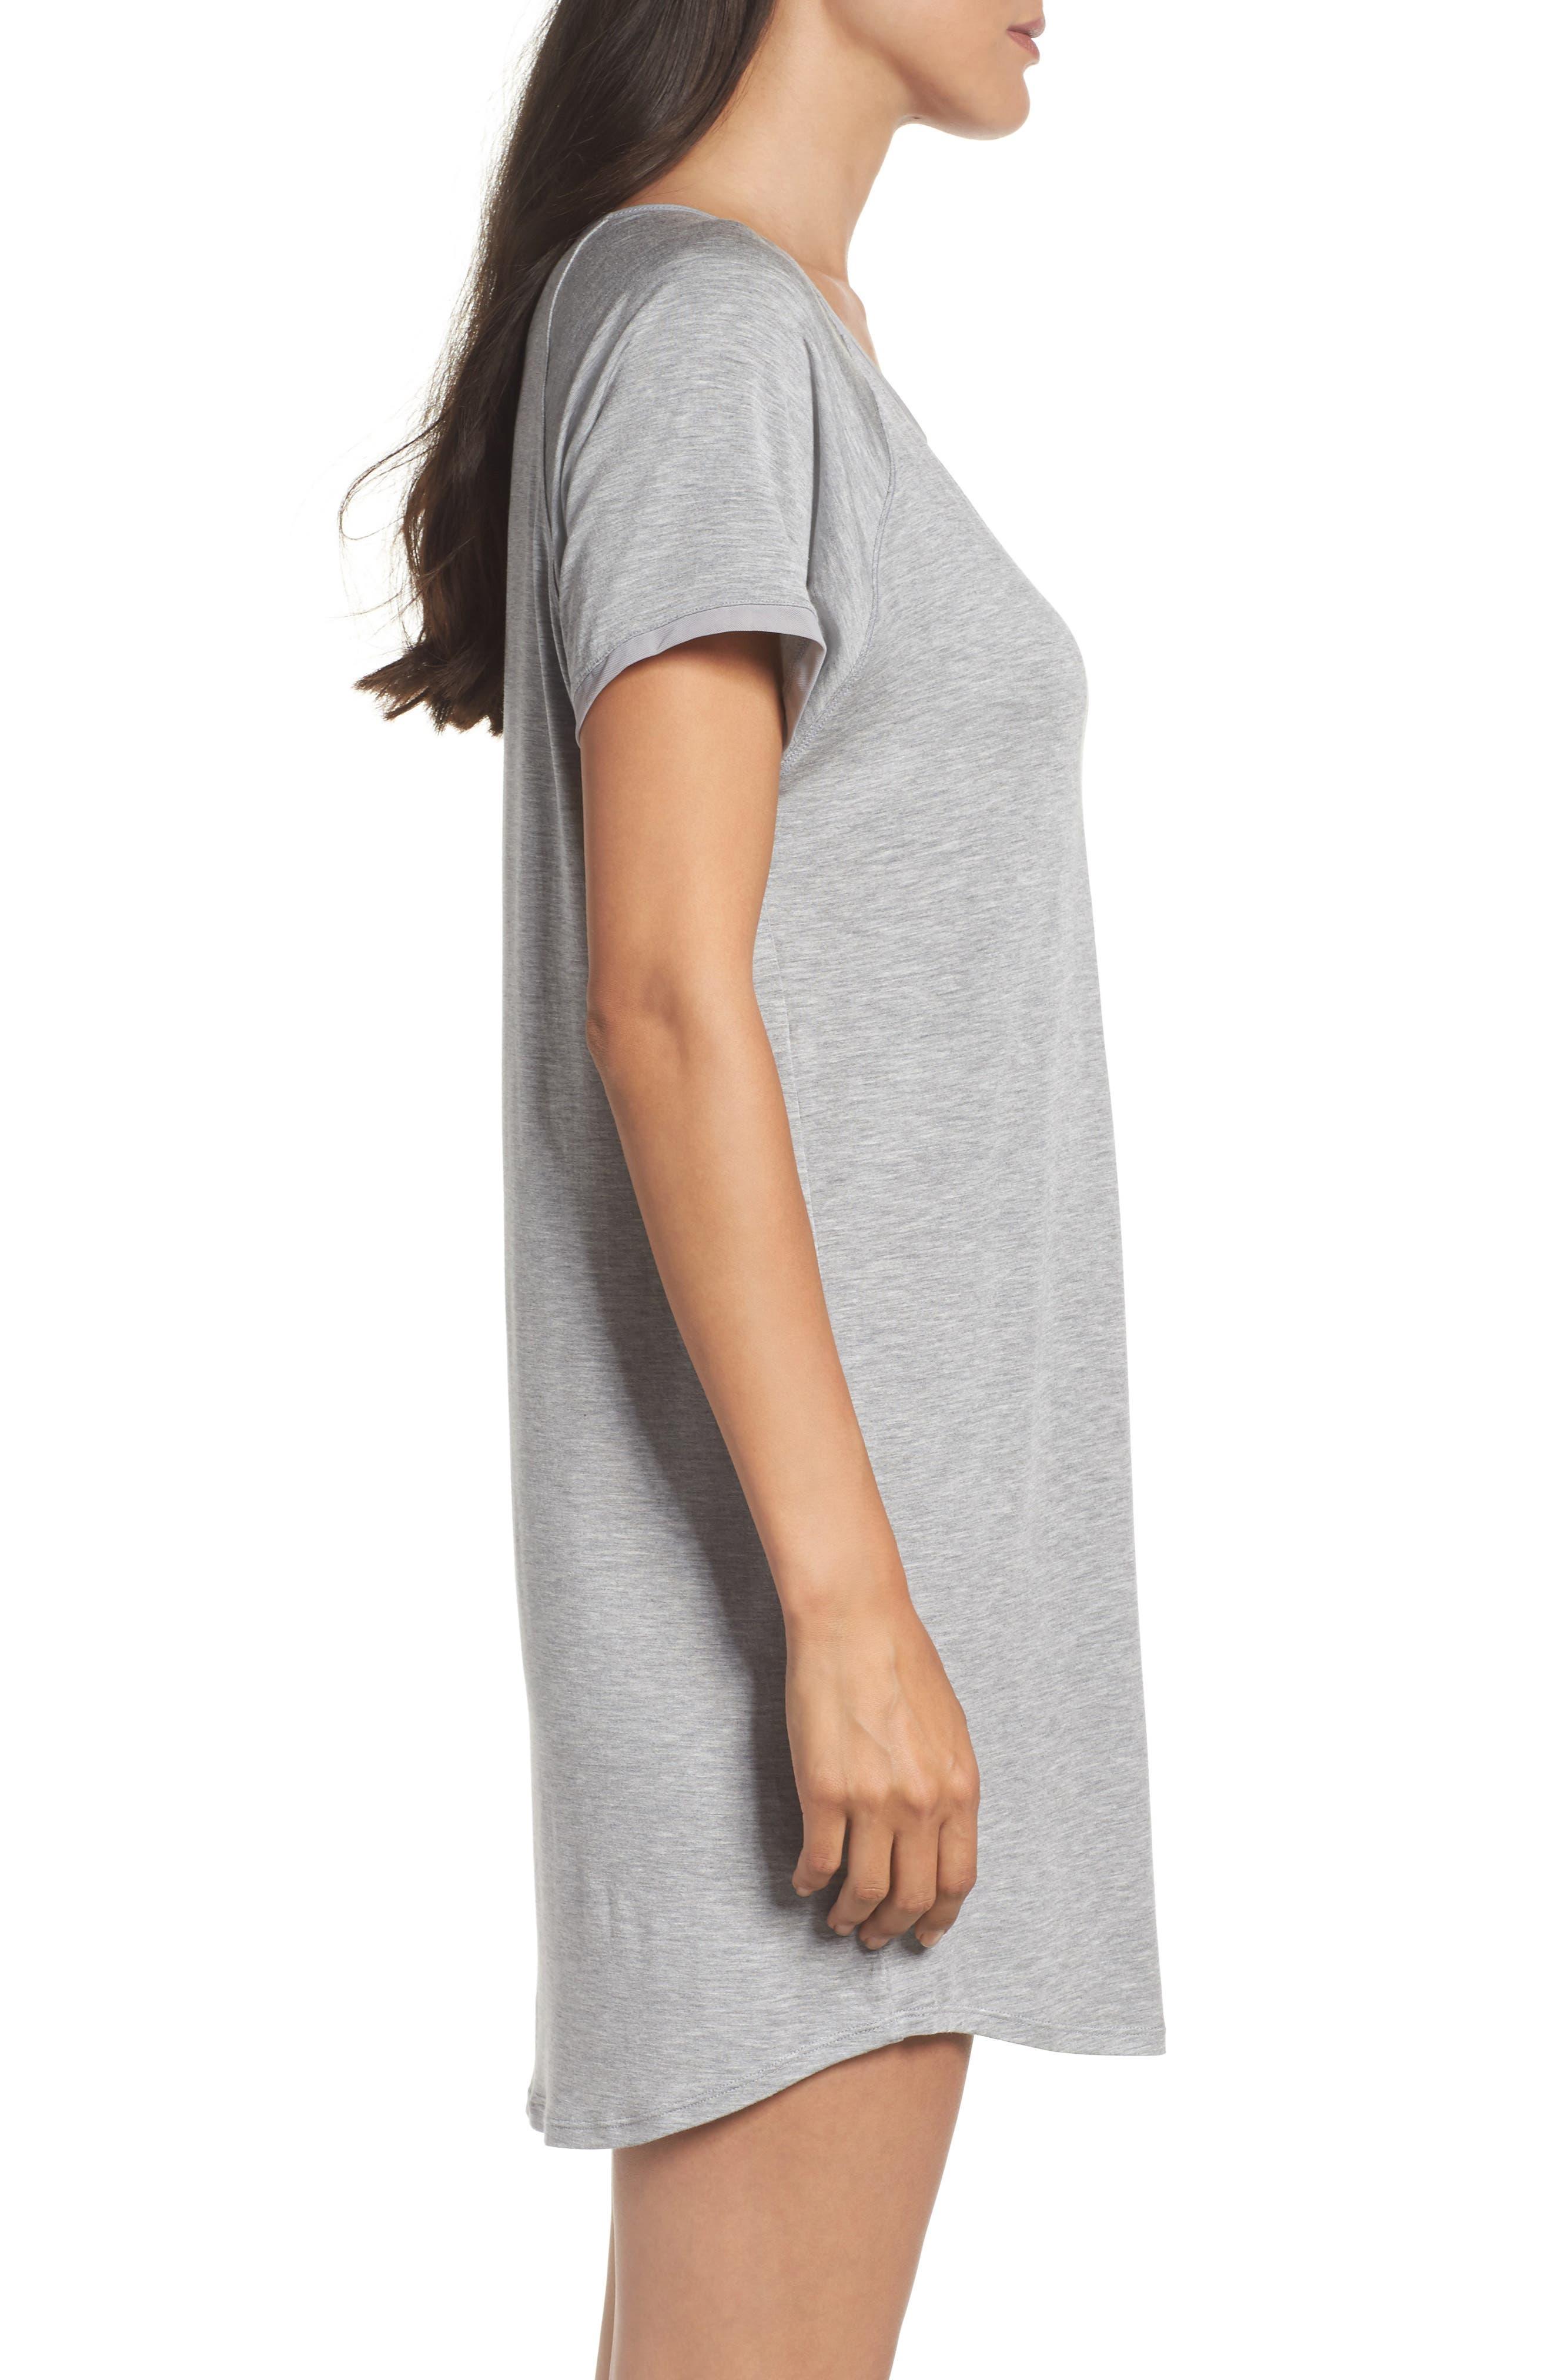 Sleep Shirt,                             Alternate thumbnail 3, color,                             Light Grey Heather